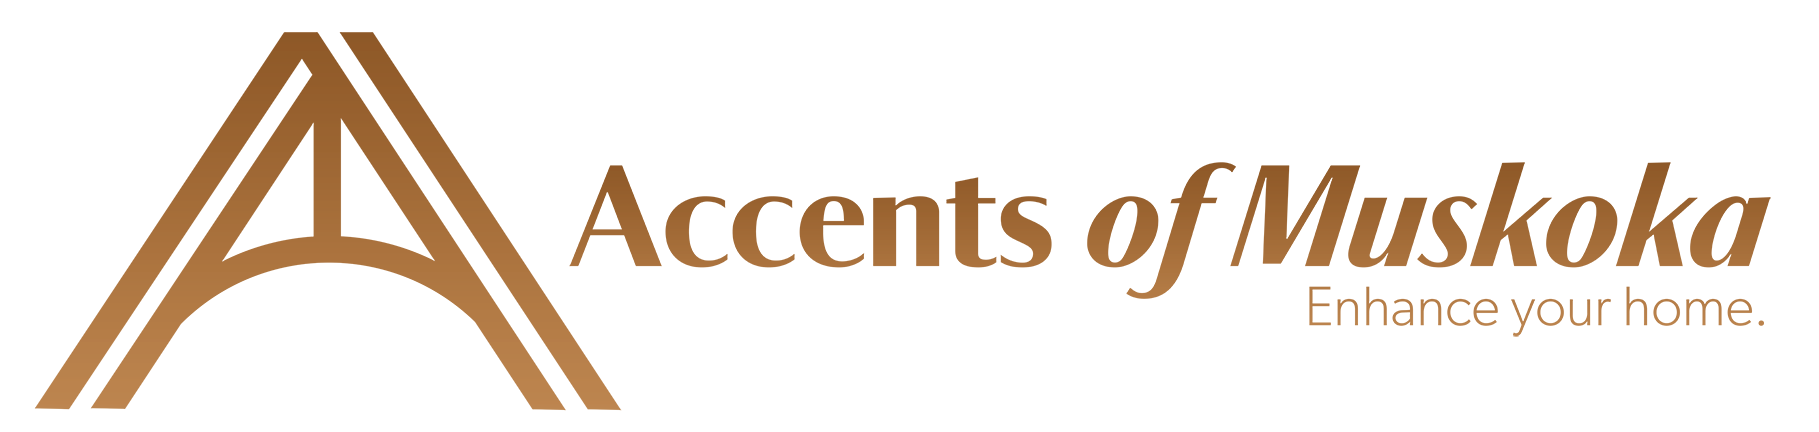 Accents of Muskoka